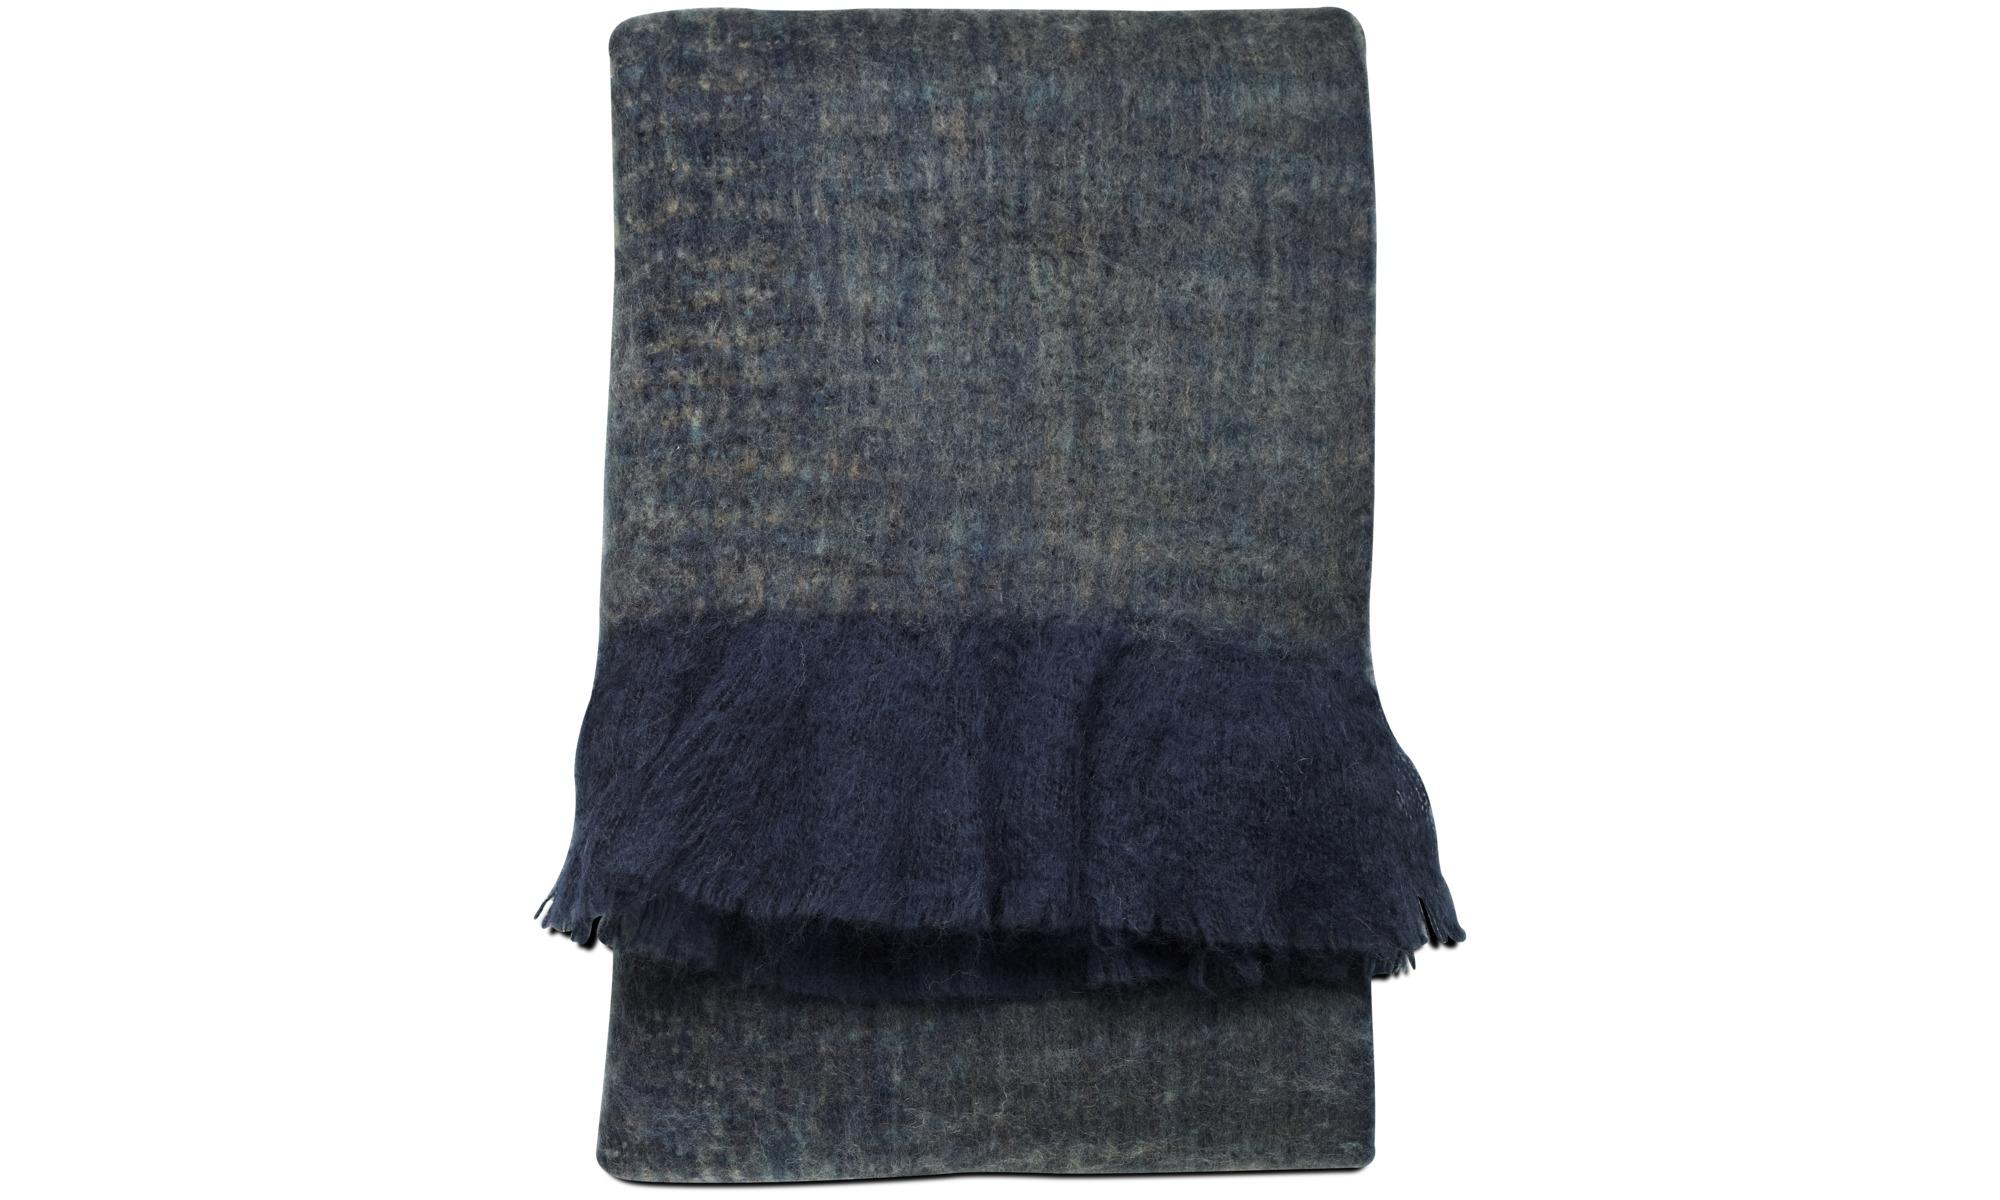 Narzuty - Pled Knit - Niebieski - Tkanina